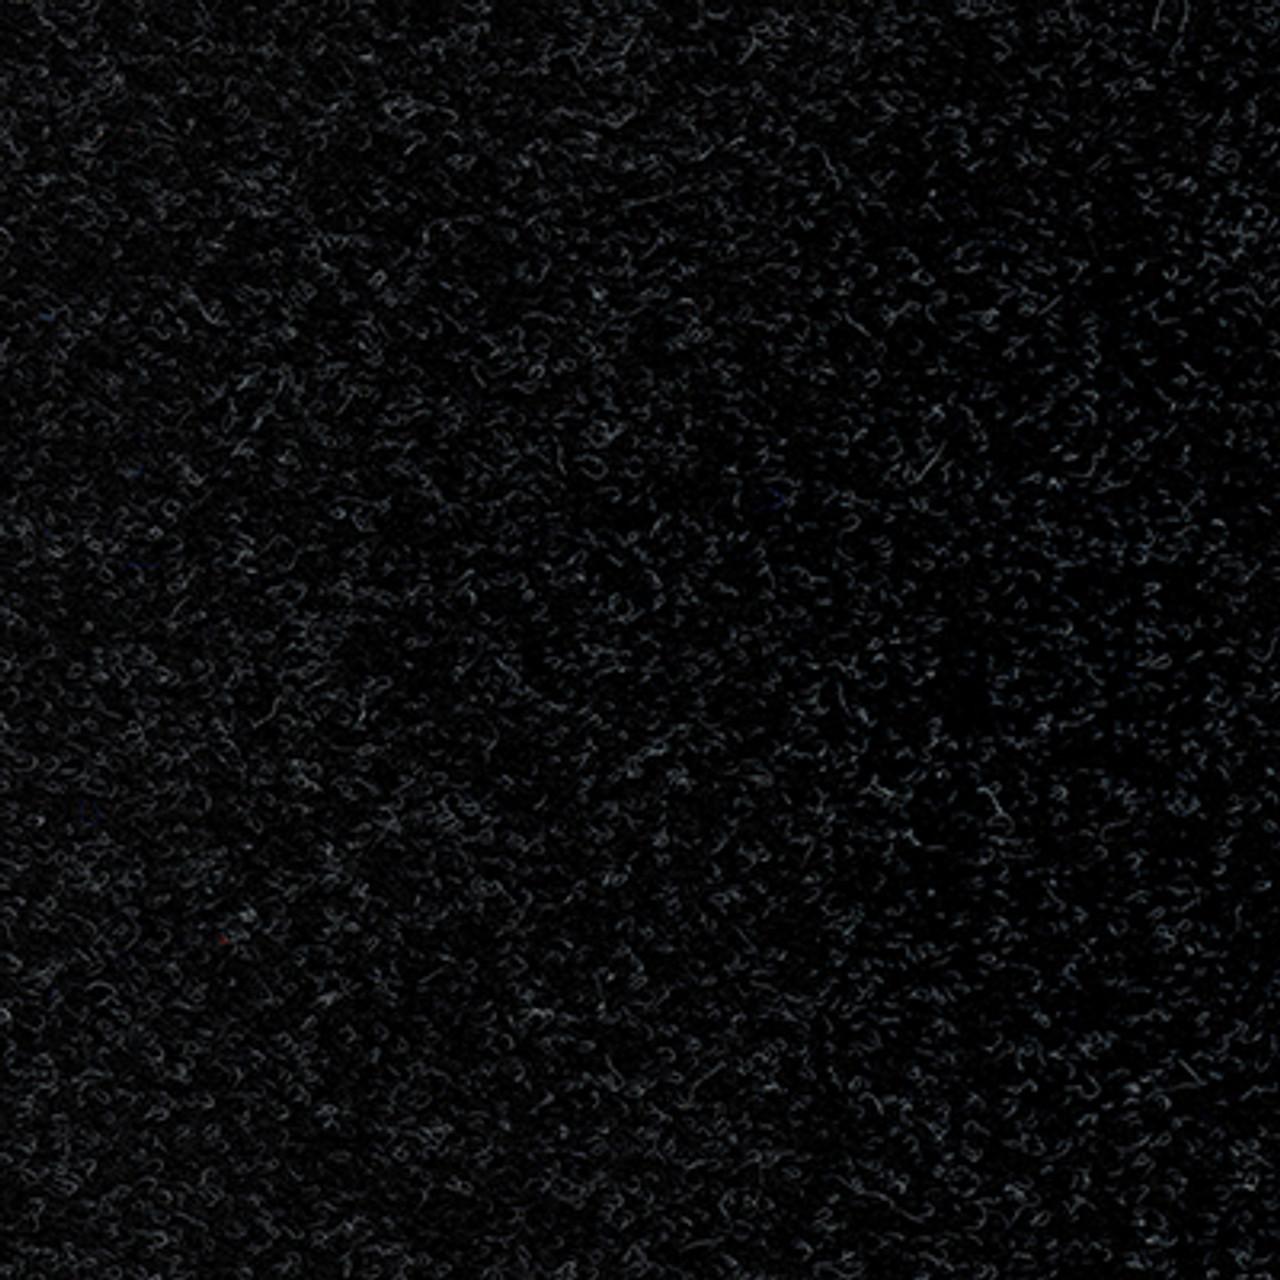 Carpet Marine Grade 'Carbon' 2metre x 1metre